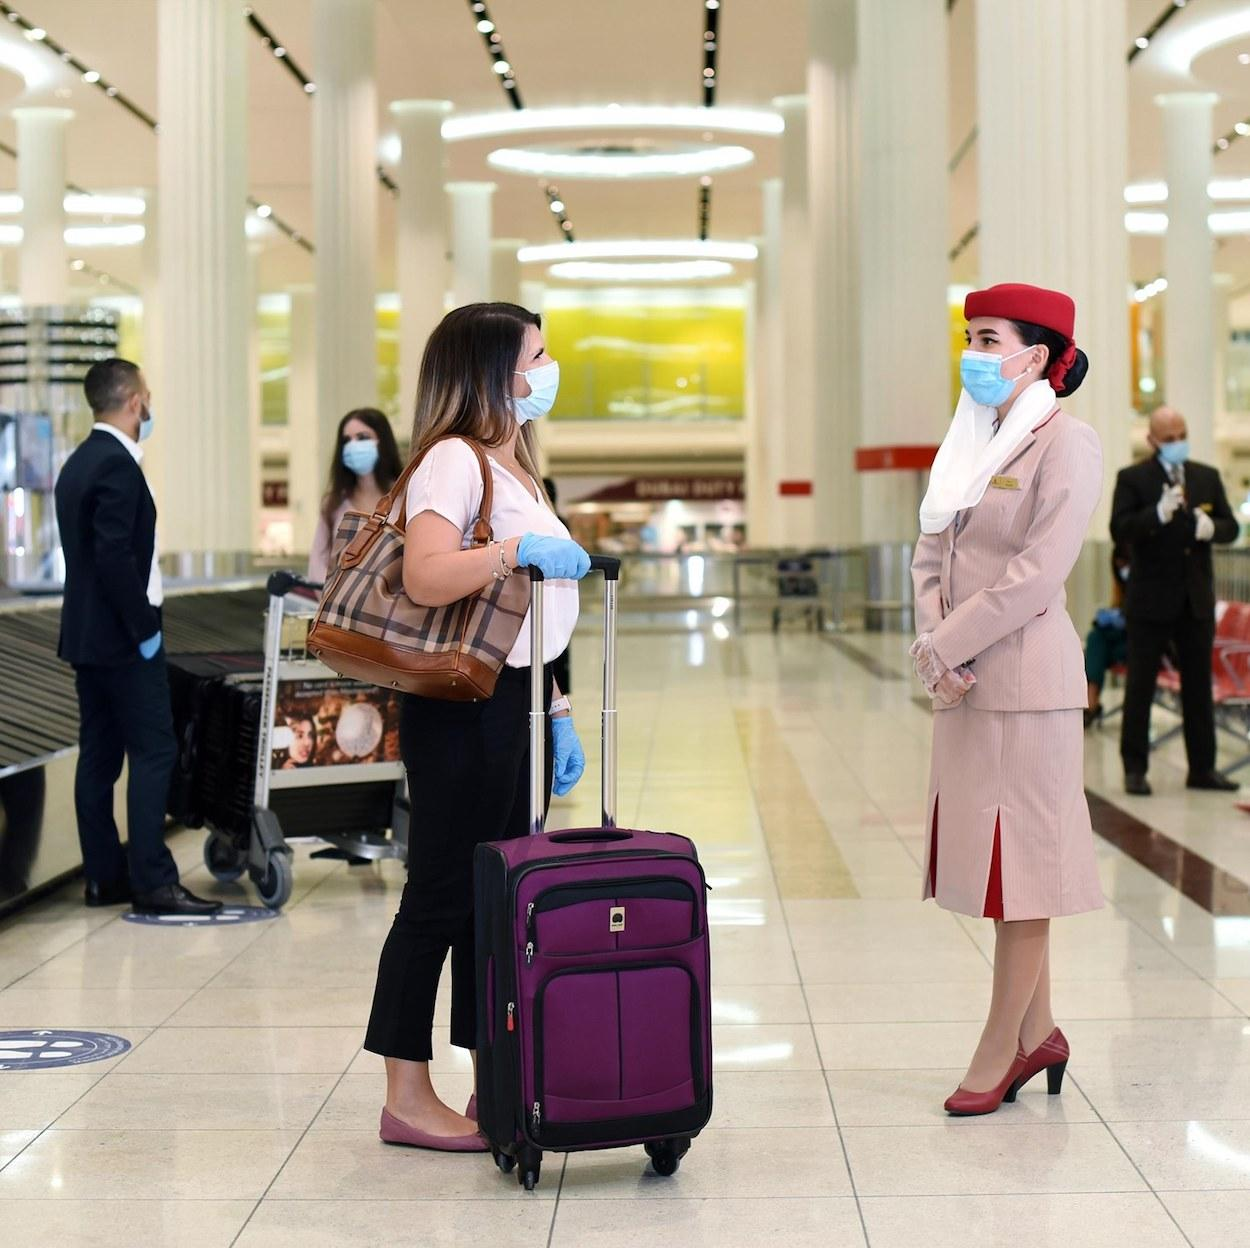 Emirates vai financiar tratamento